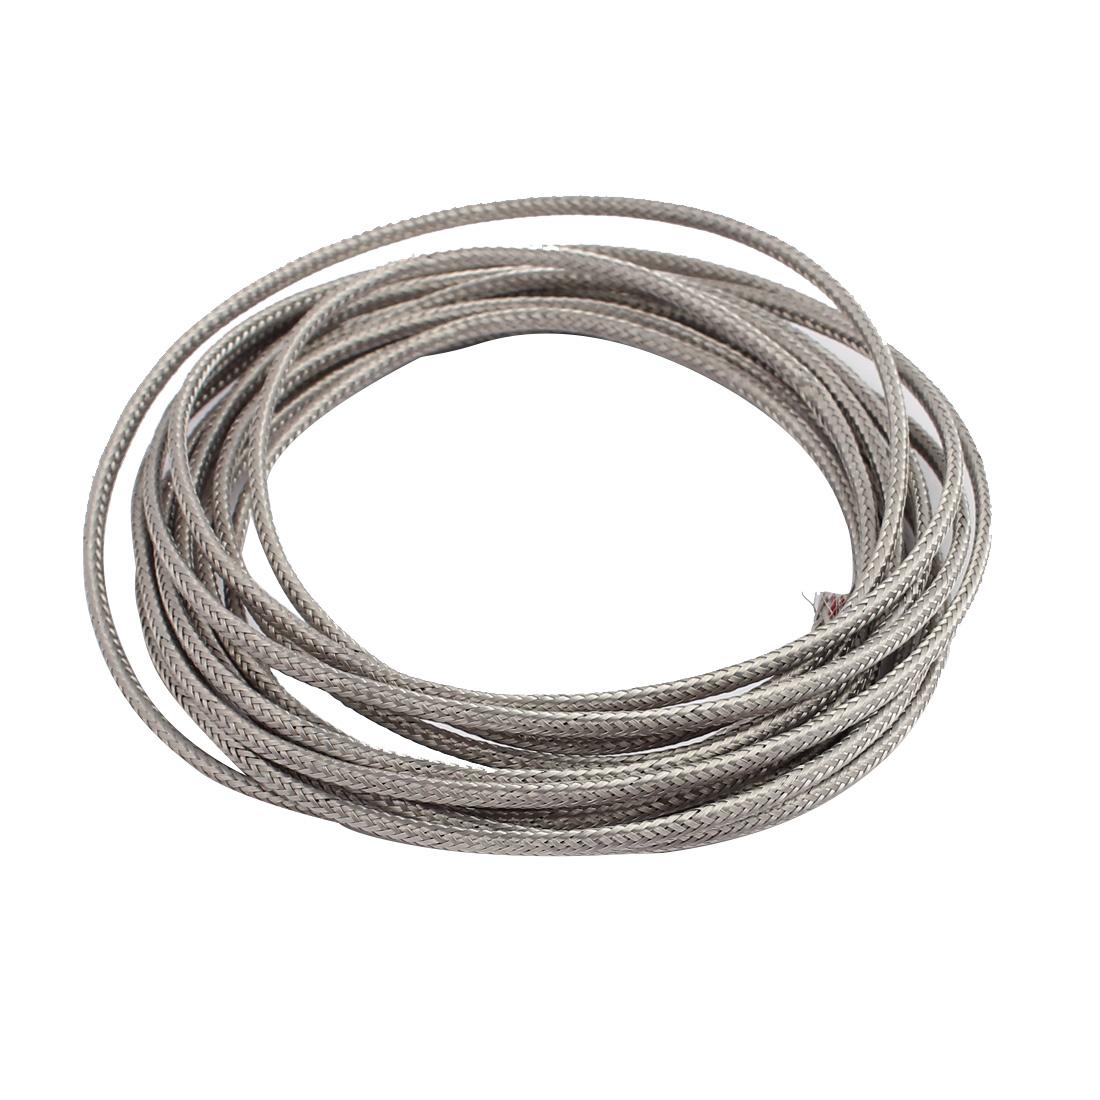 3.1M Length 0.5mm Dia. Temperature Sensor Thermocouple Wire Cable Gray